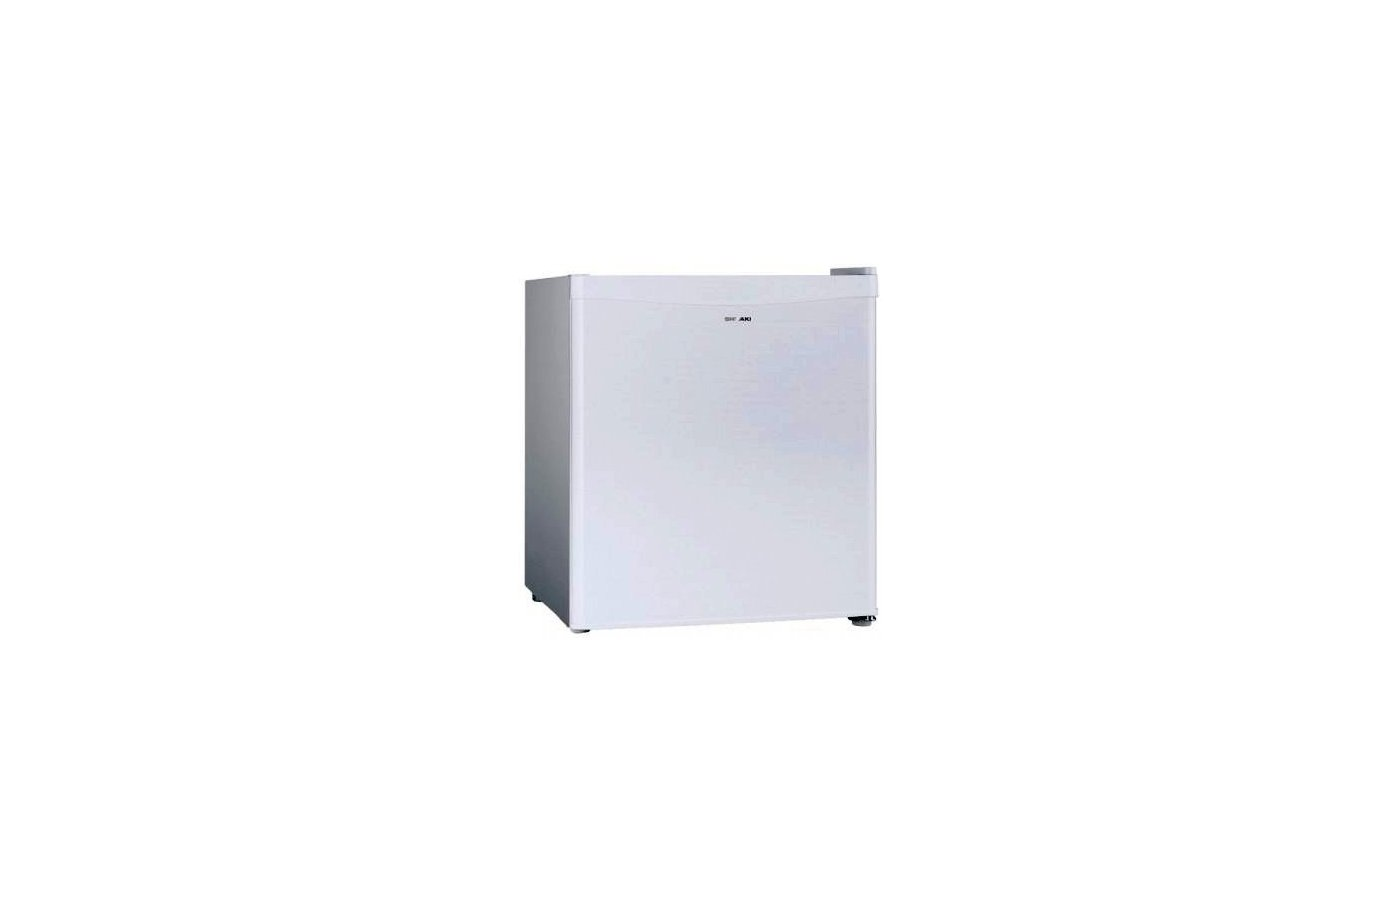 Морозильная камера вертикальная SHIVAKI SFR-55W